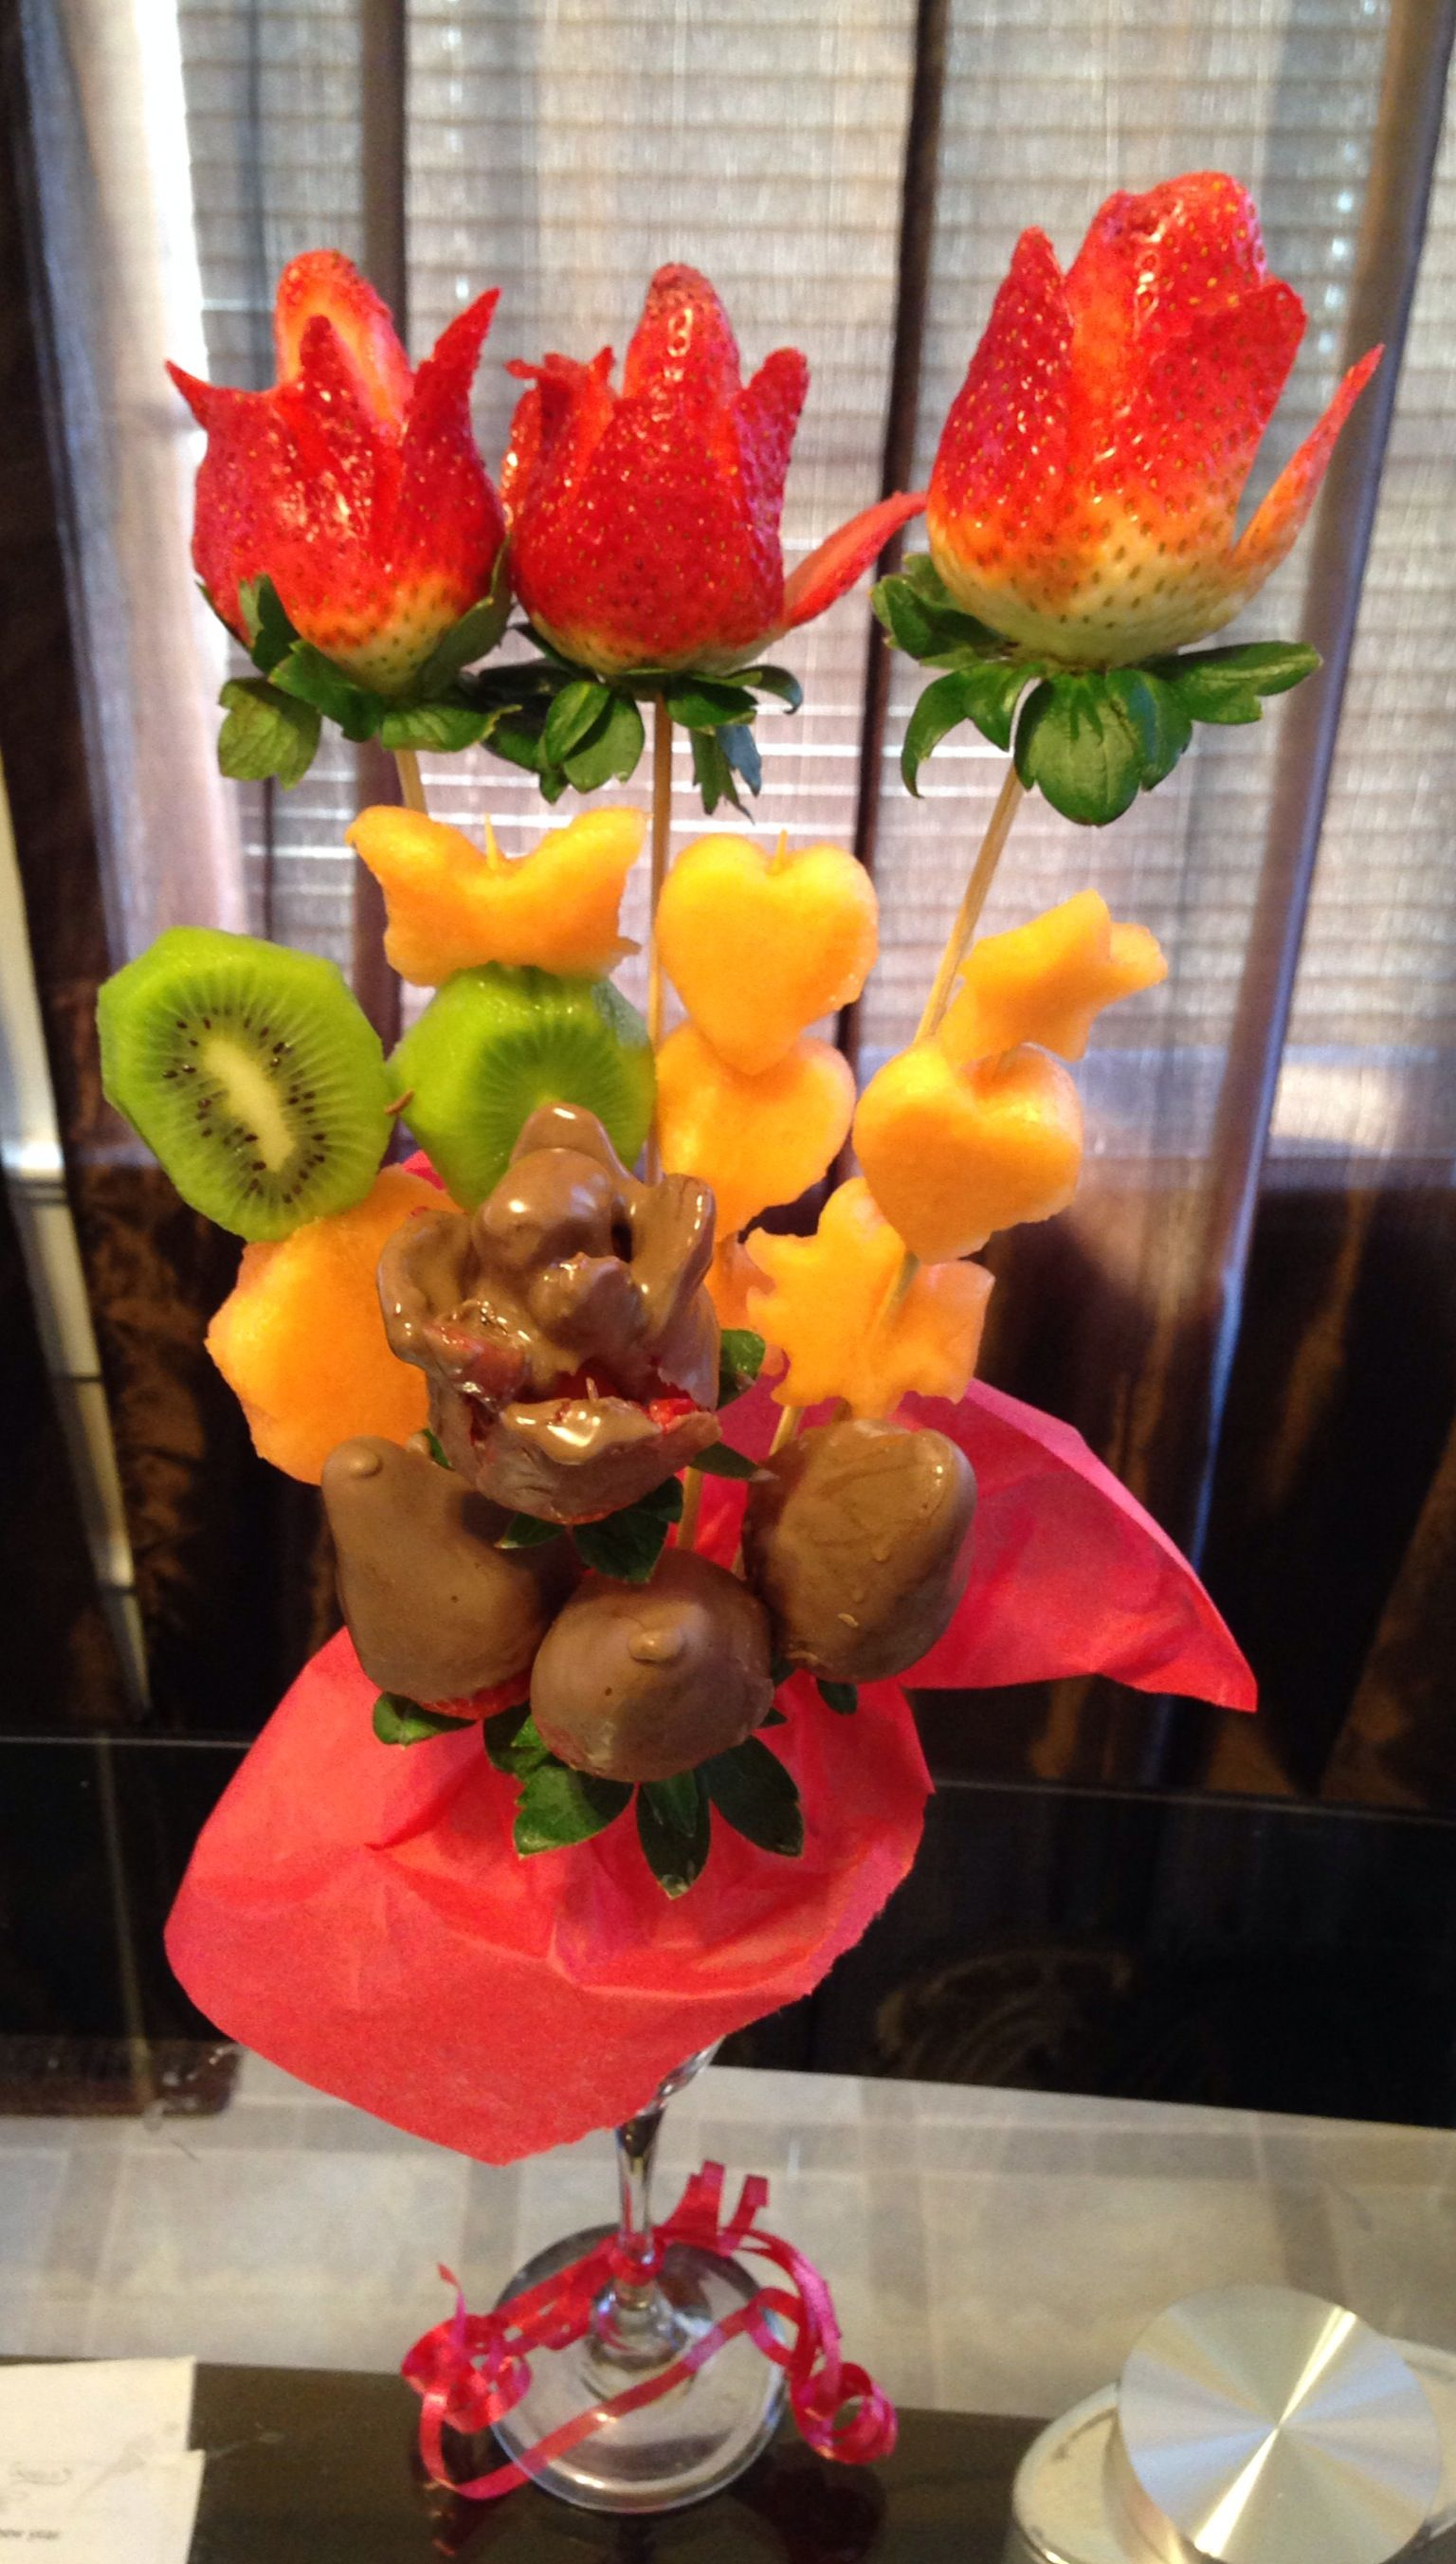 arreglos frutales 3d artistic gelatin pinterest